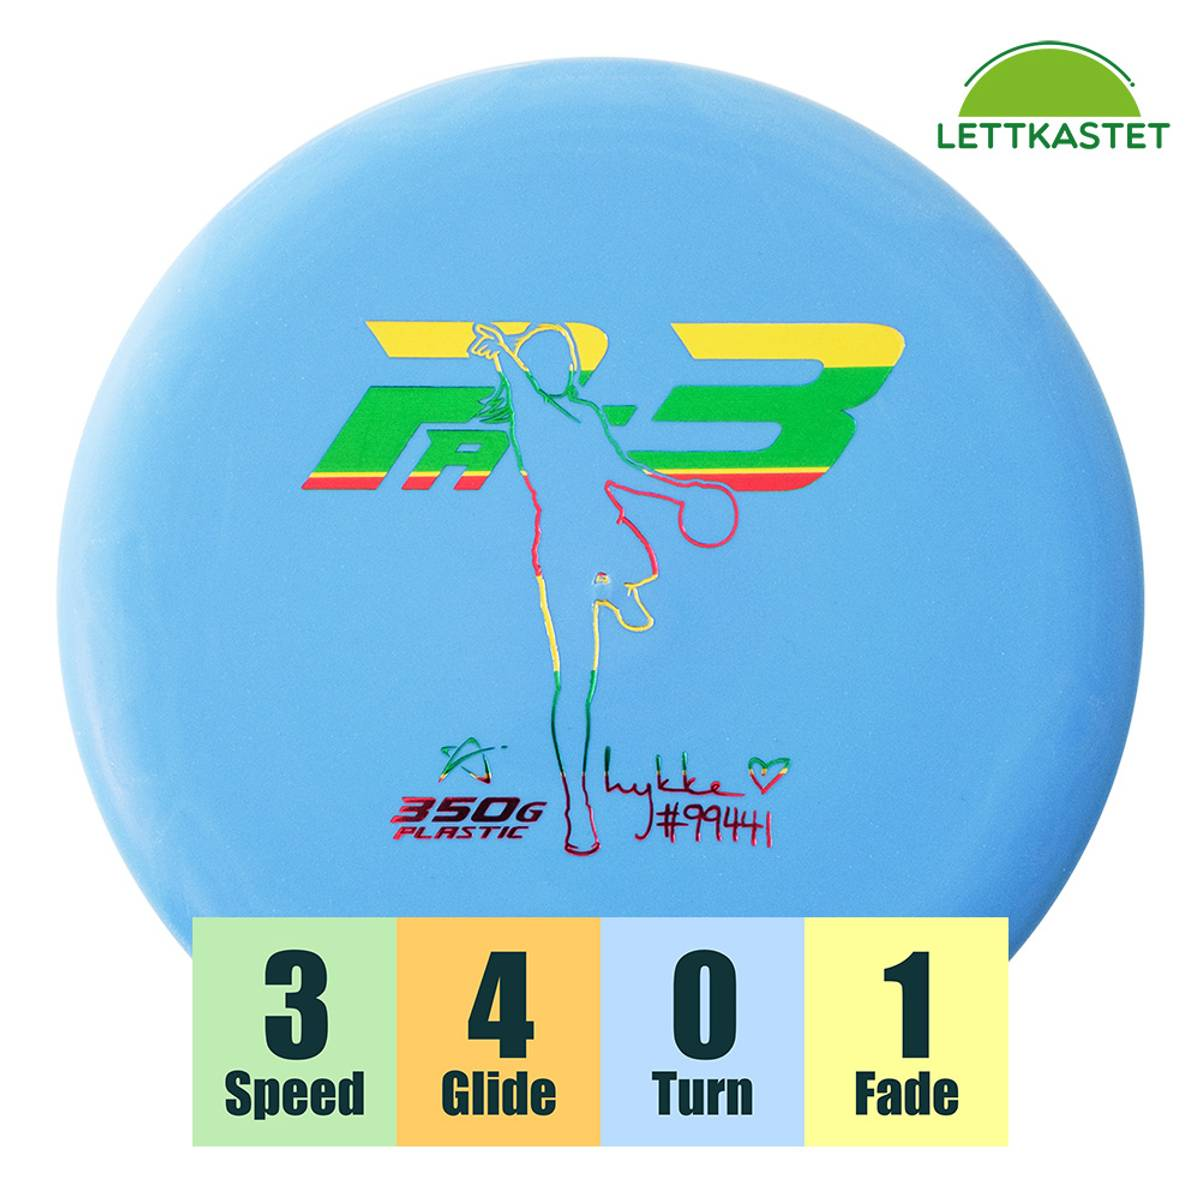 350G Plastic Pa-3 Lykke Lorentzen